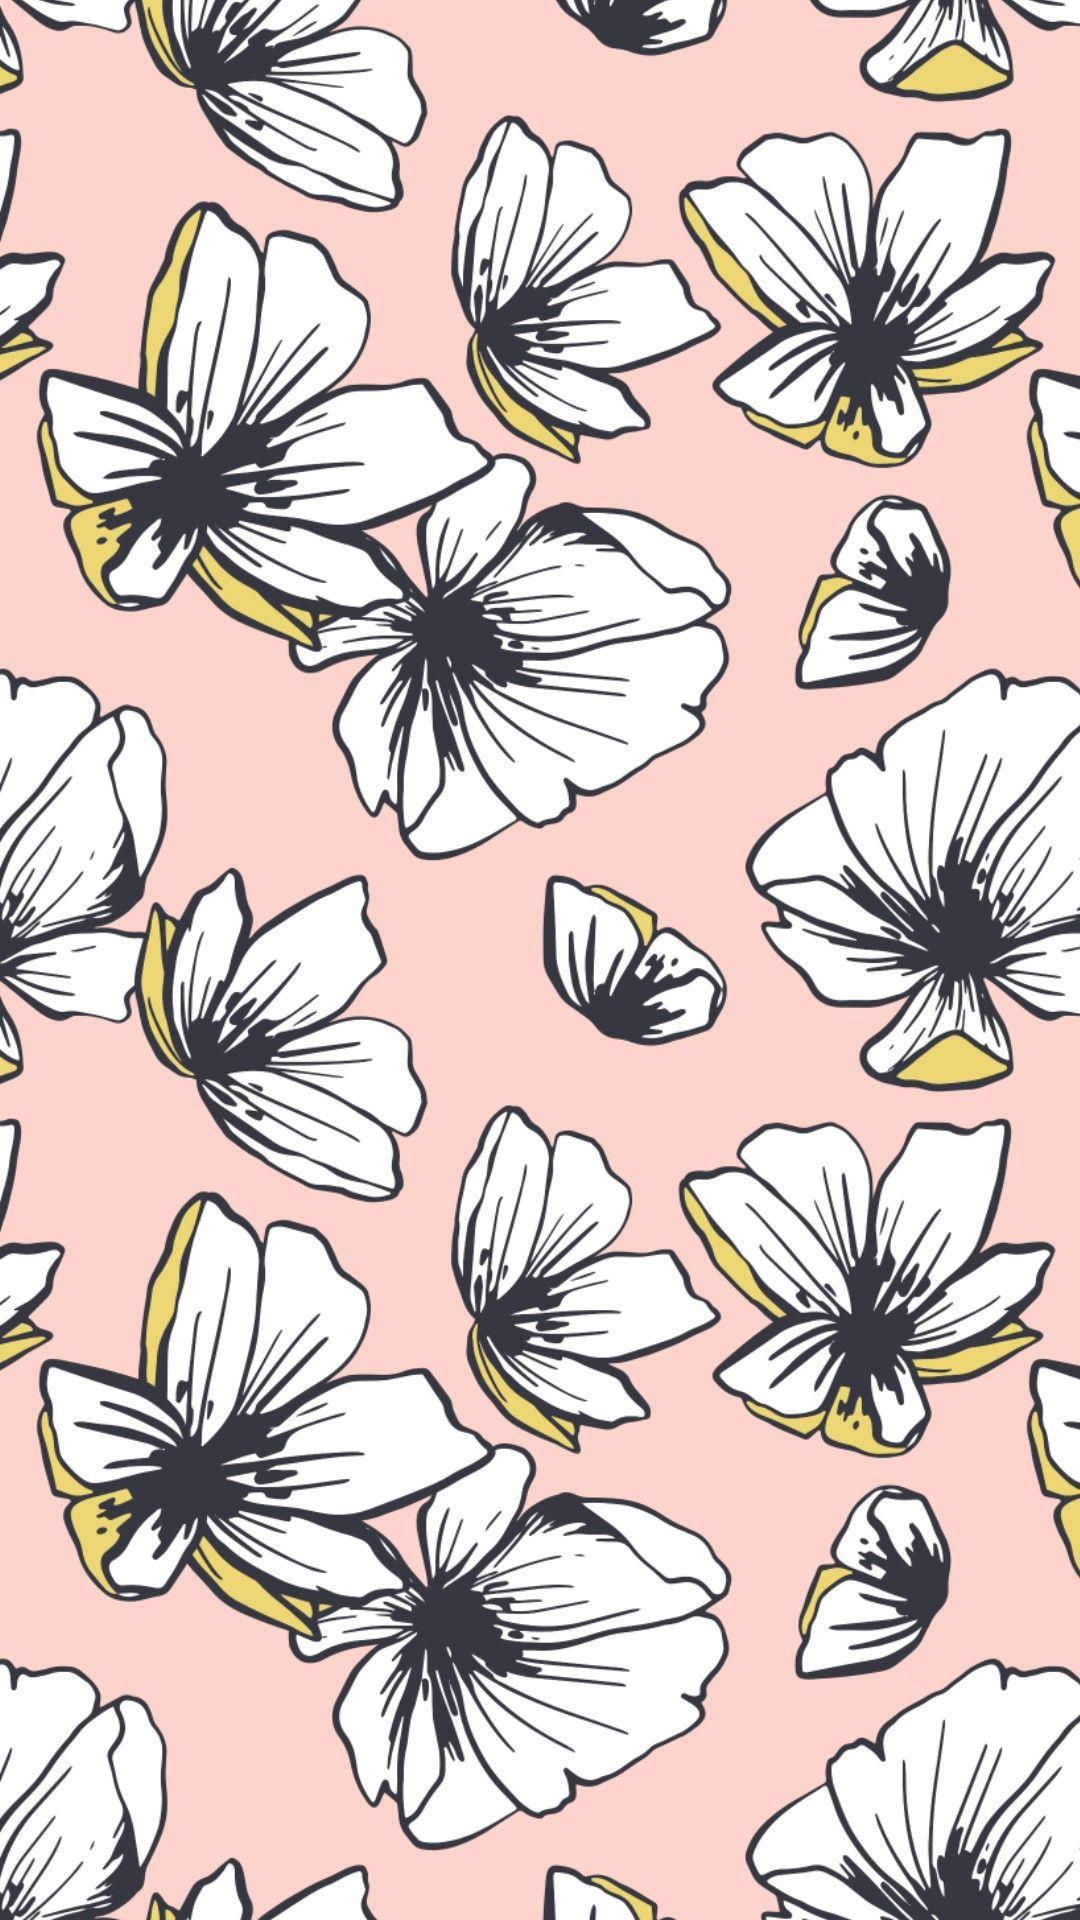 𝚙𝚒𝚗𝚝𝚎𝚛𝚎𝚜𝚝 𝚜𝚘𝚏𝚒𝚊 𝚘𝚙𝚊𝚣𝚘 Plant Wallpaper